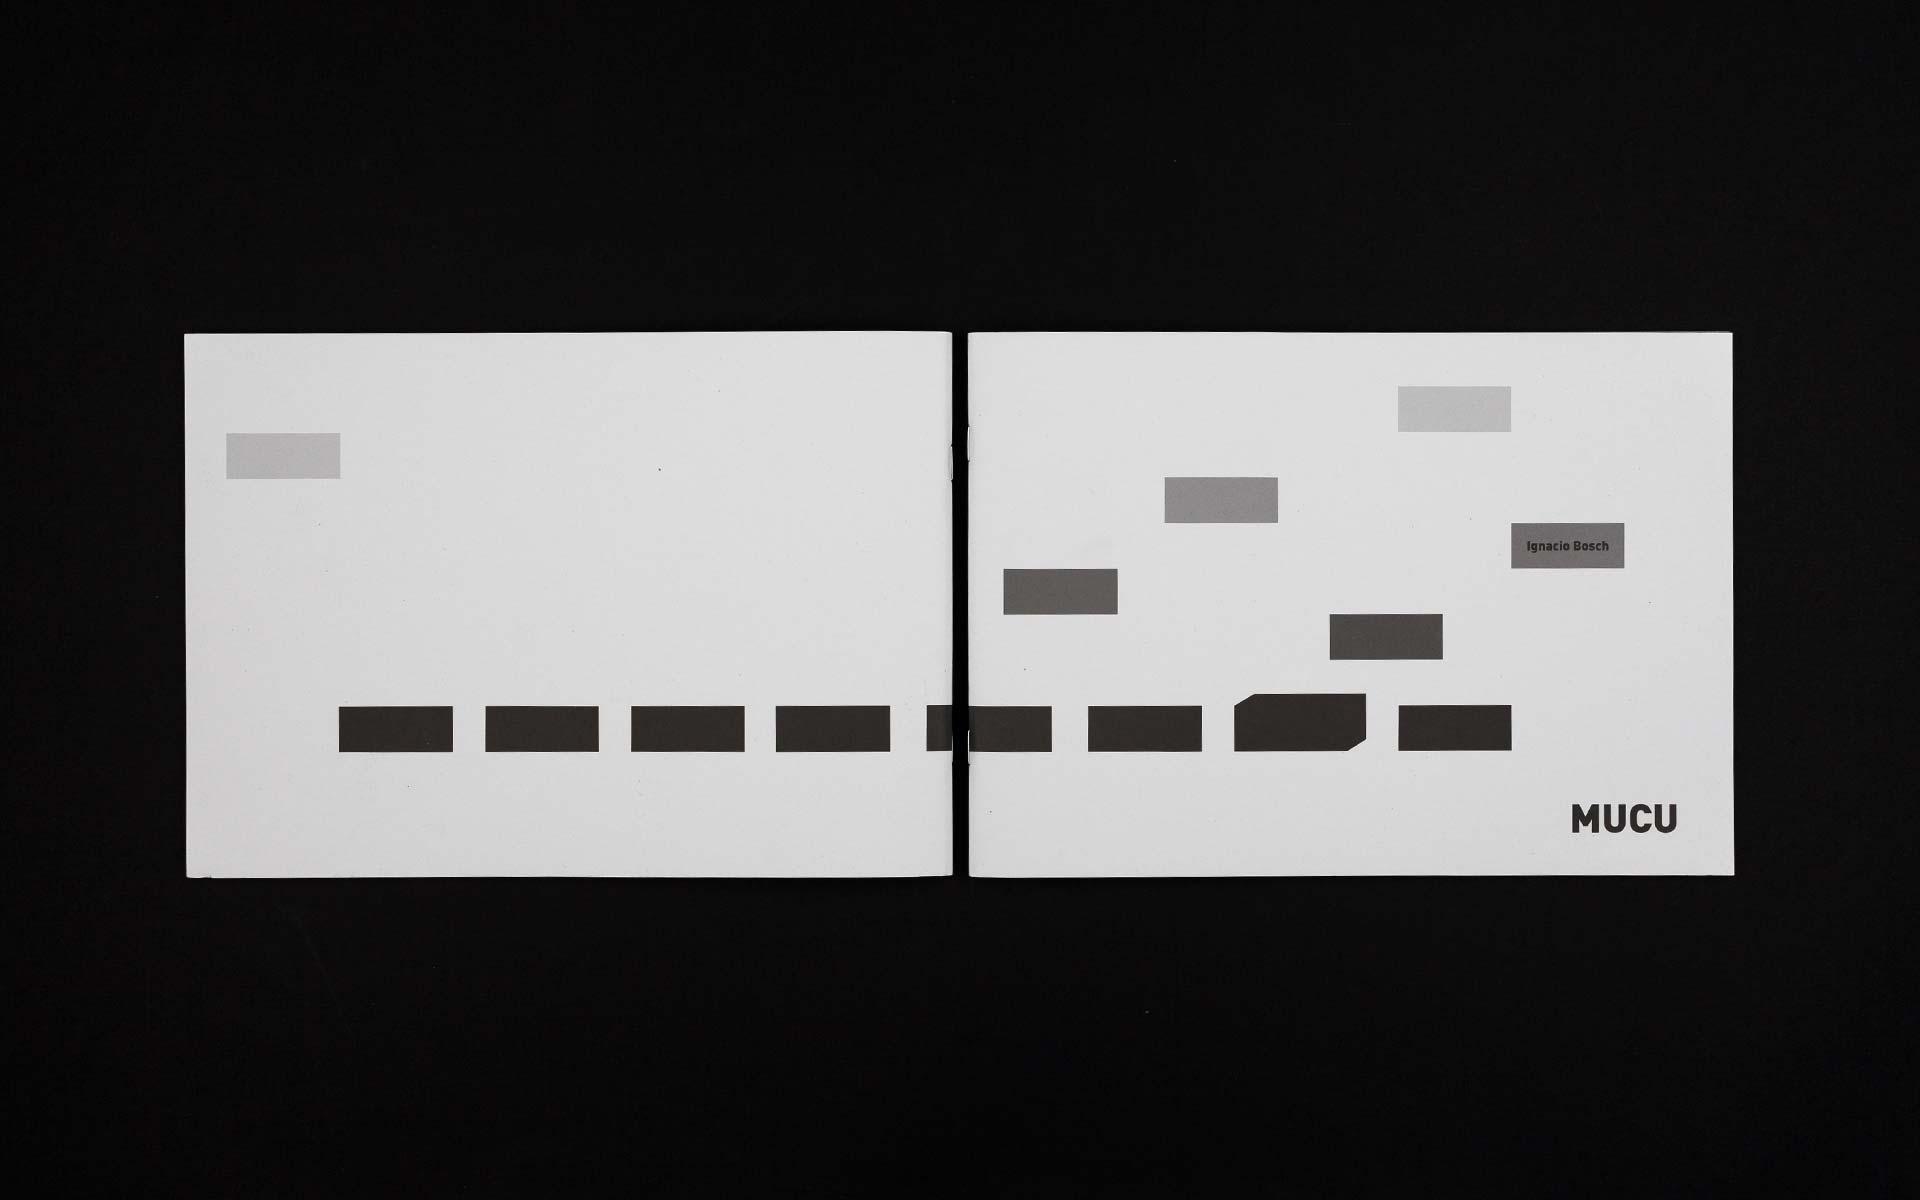 disseny-grafic-mallorca-hastalastantas-Mucu1